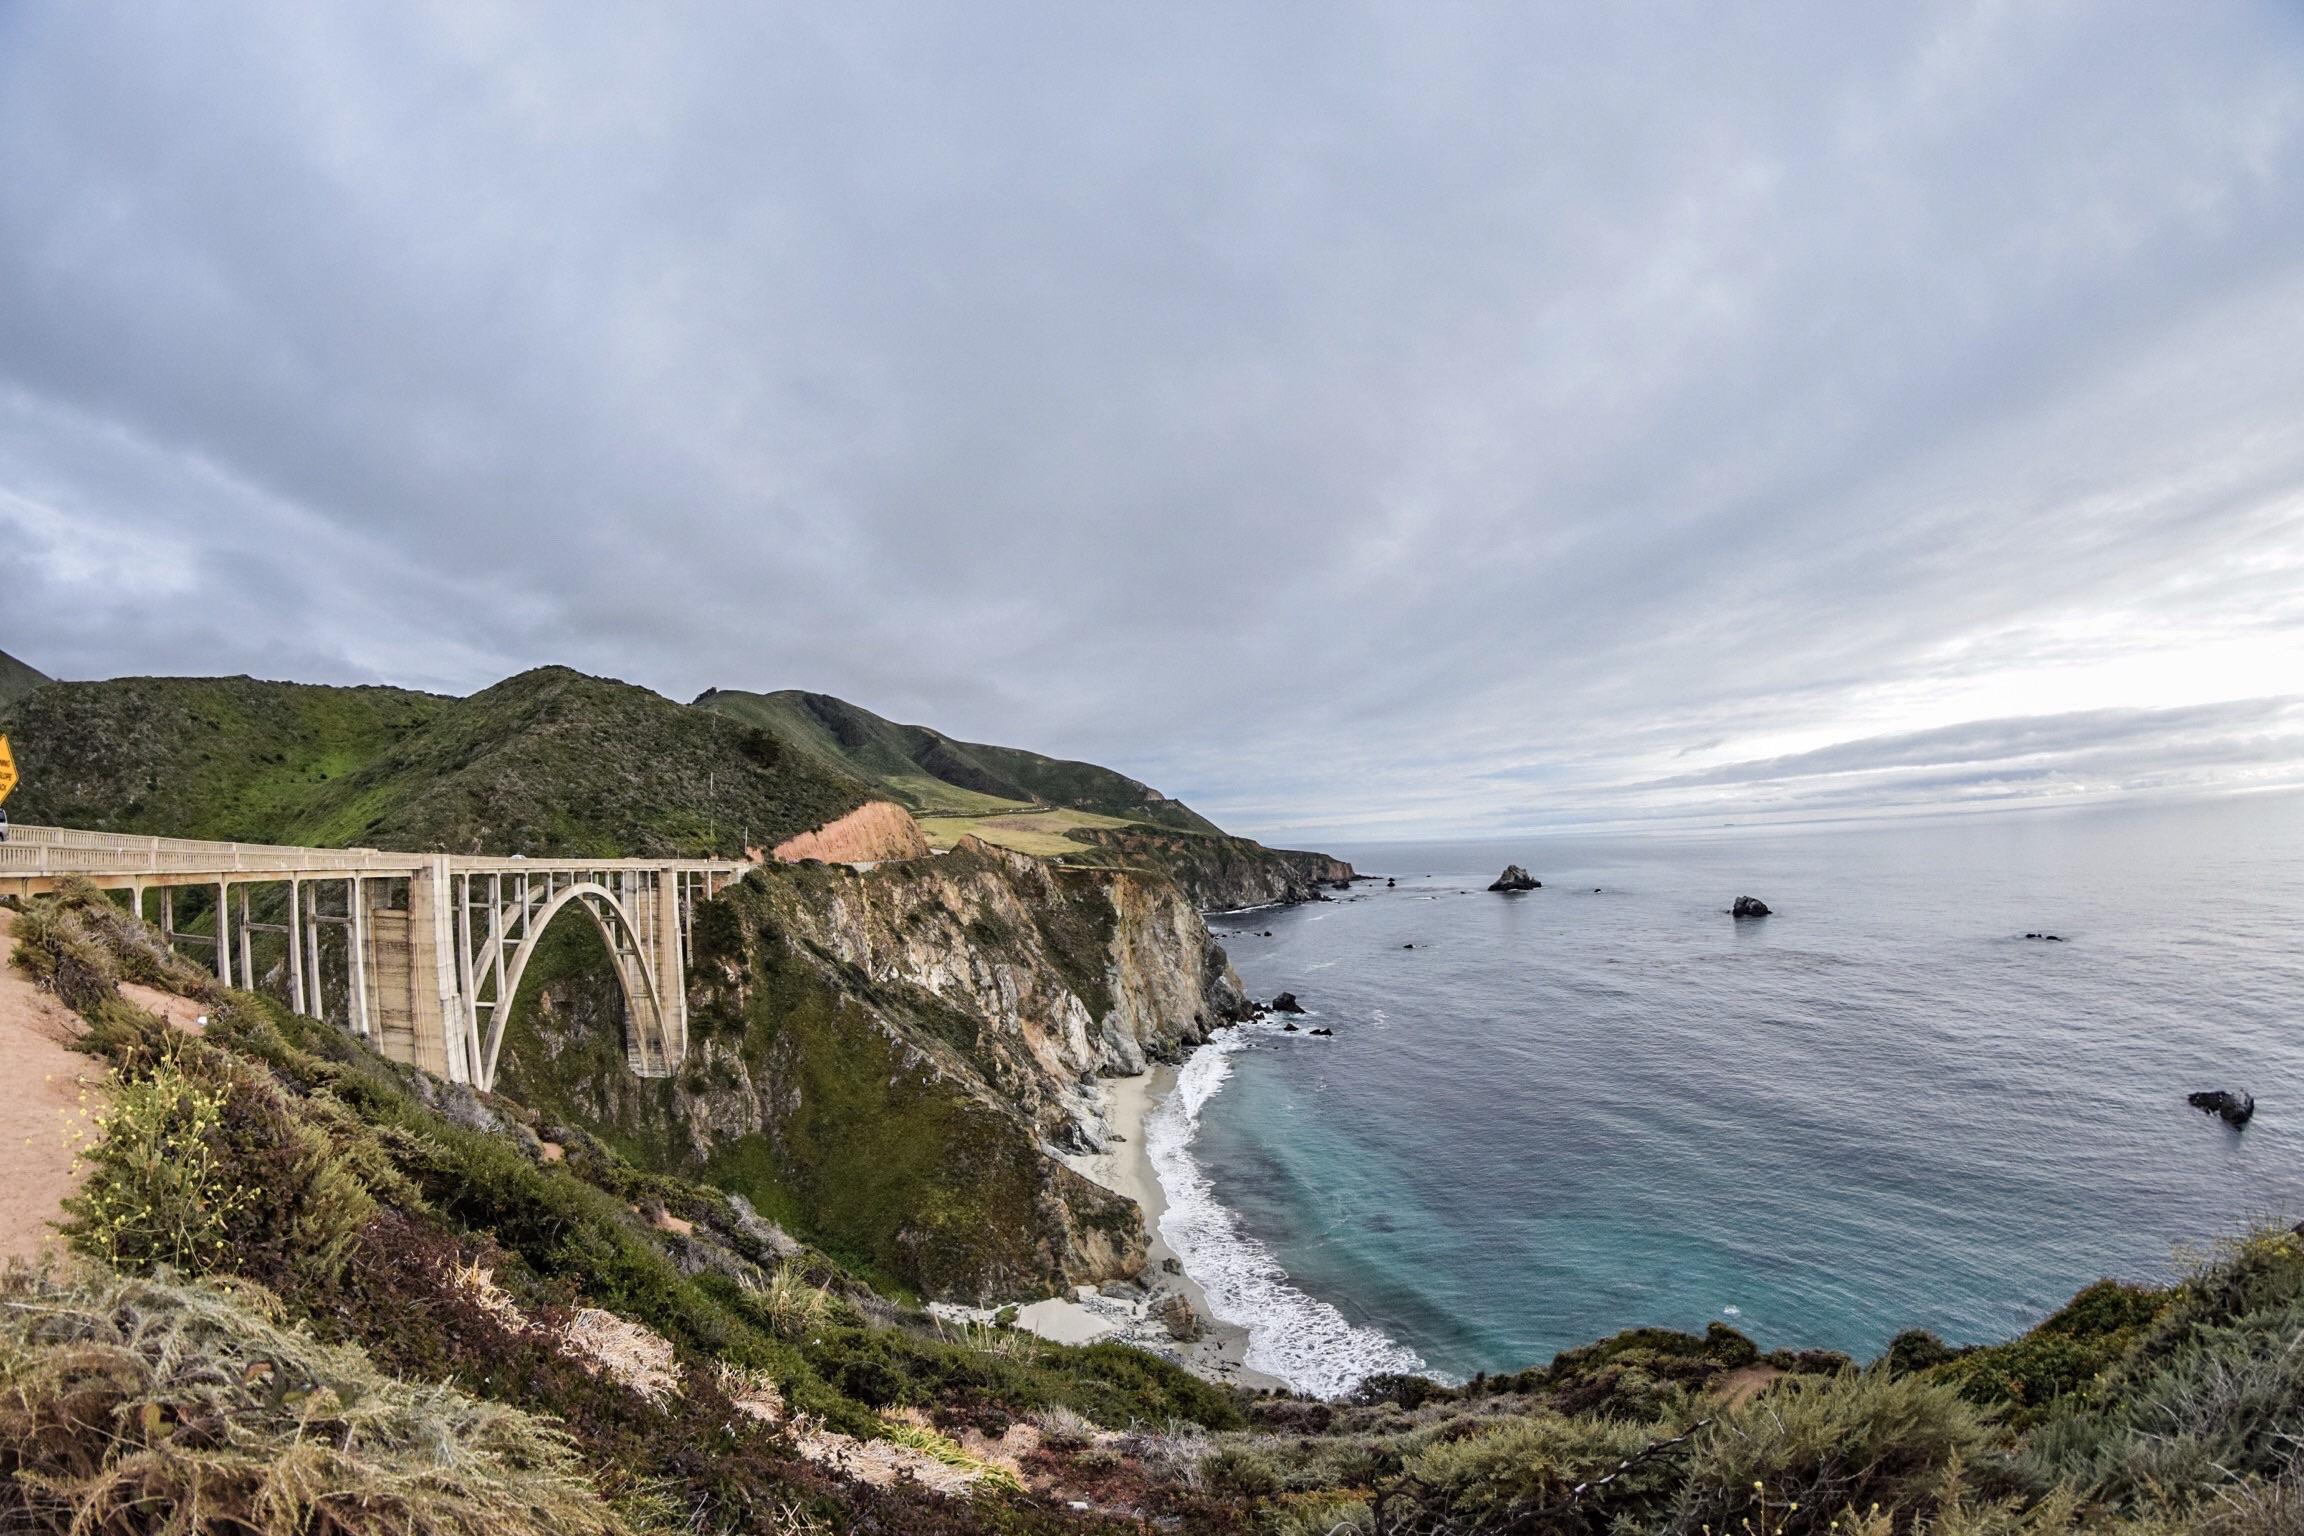 Bixby Bridge, north of Big Sur and south of Monterrey